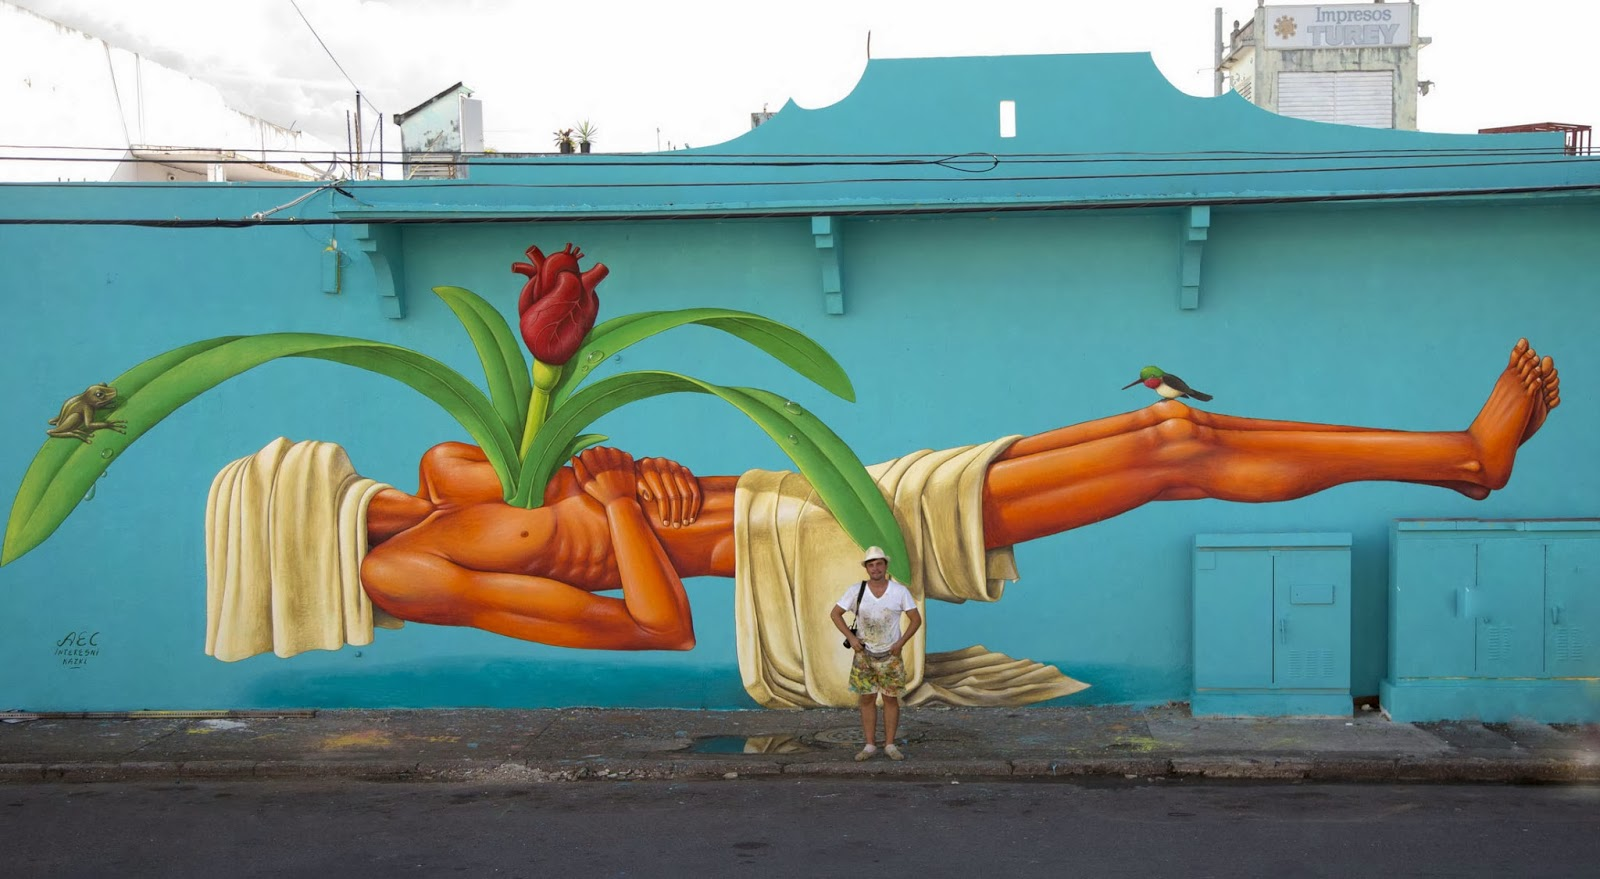 interesni-kazki-new-mural-los-muros-hablan-09